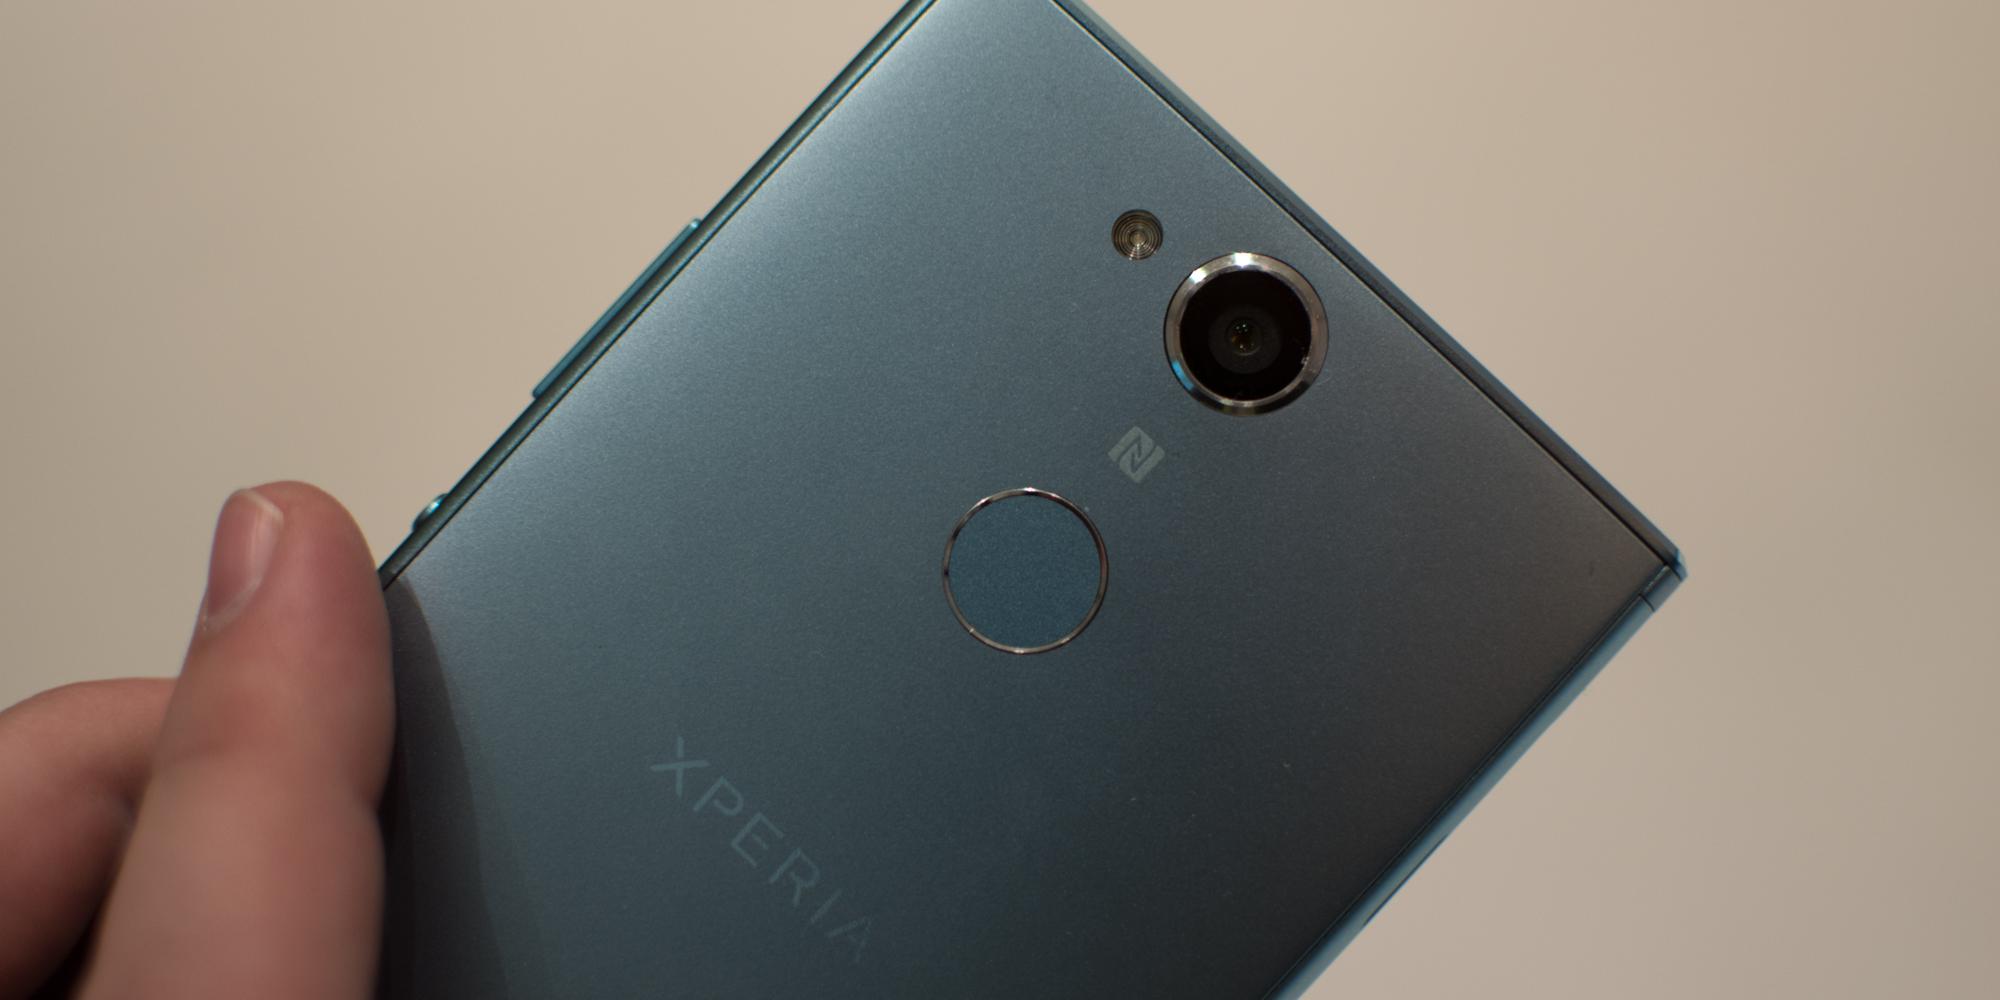 Sony Xperia XA2 gets certified for use on Verizon Wireless